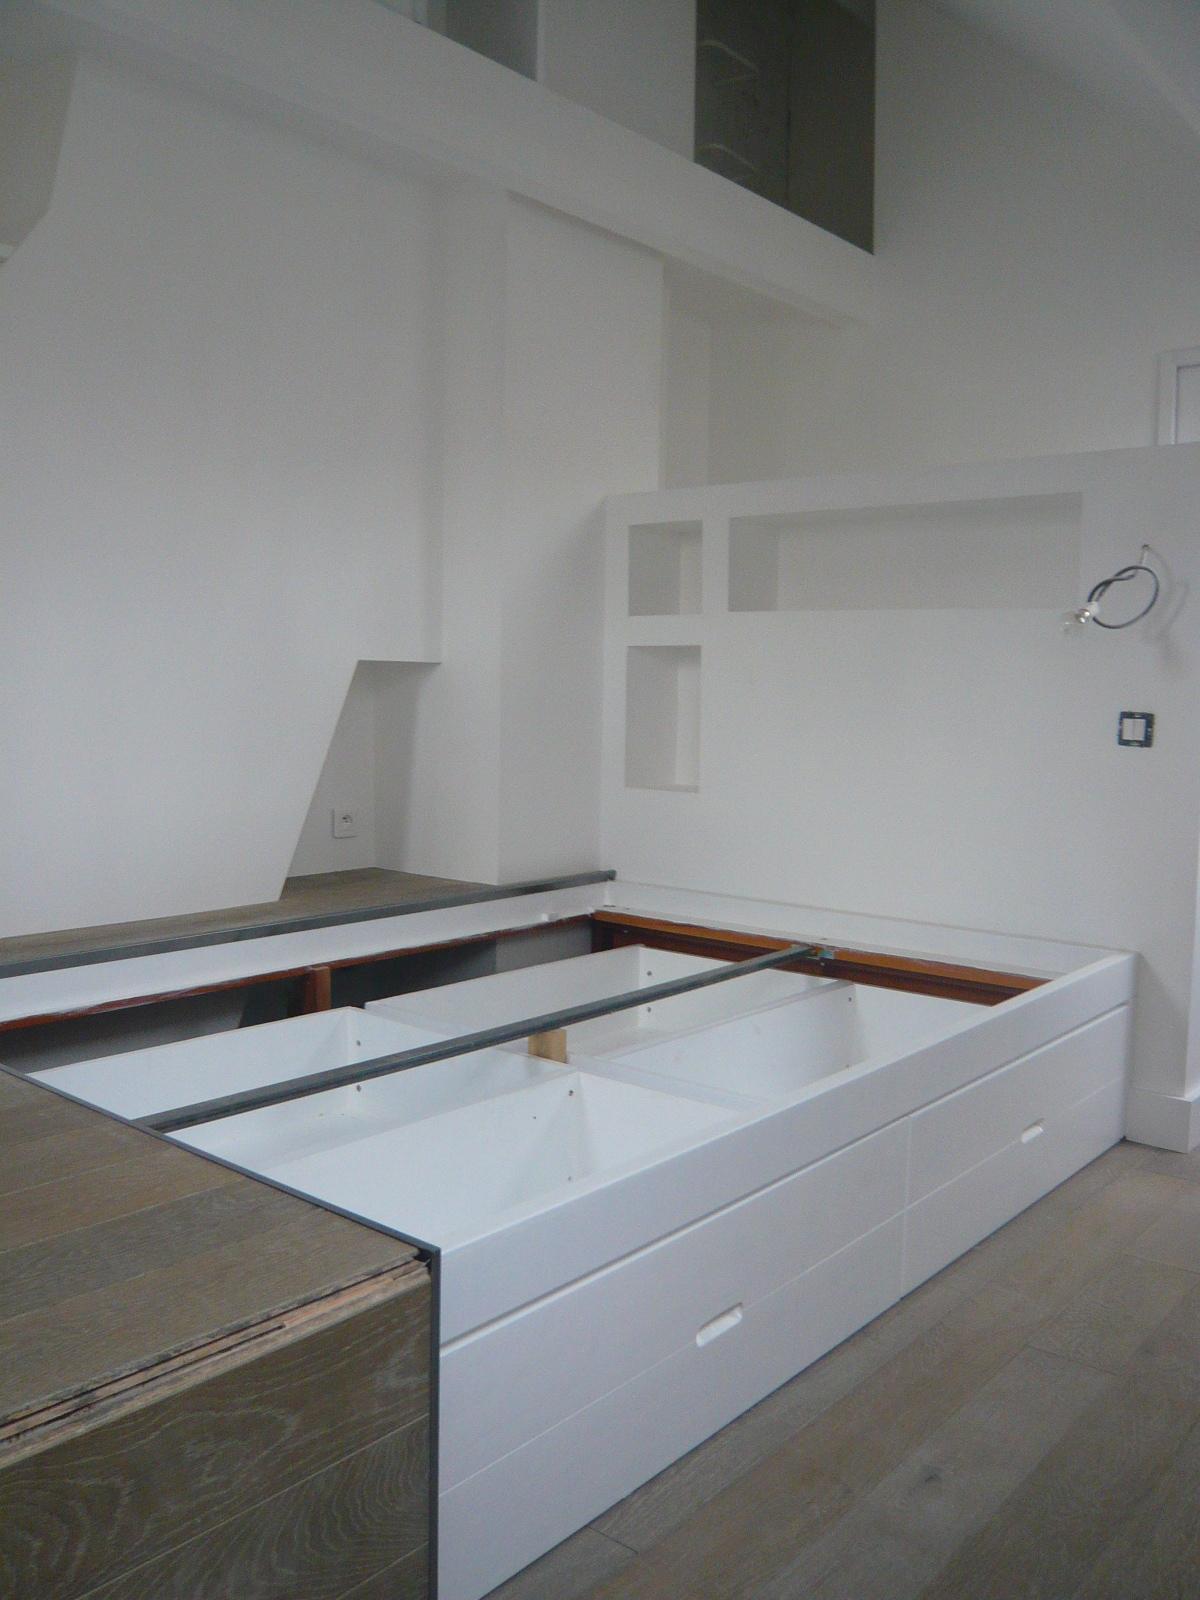 estrade lit coulissant good estrade chambre img with estrade lit coulissant finest awesome. Black Bedroom Furniture Sets. Home Design Ideas